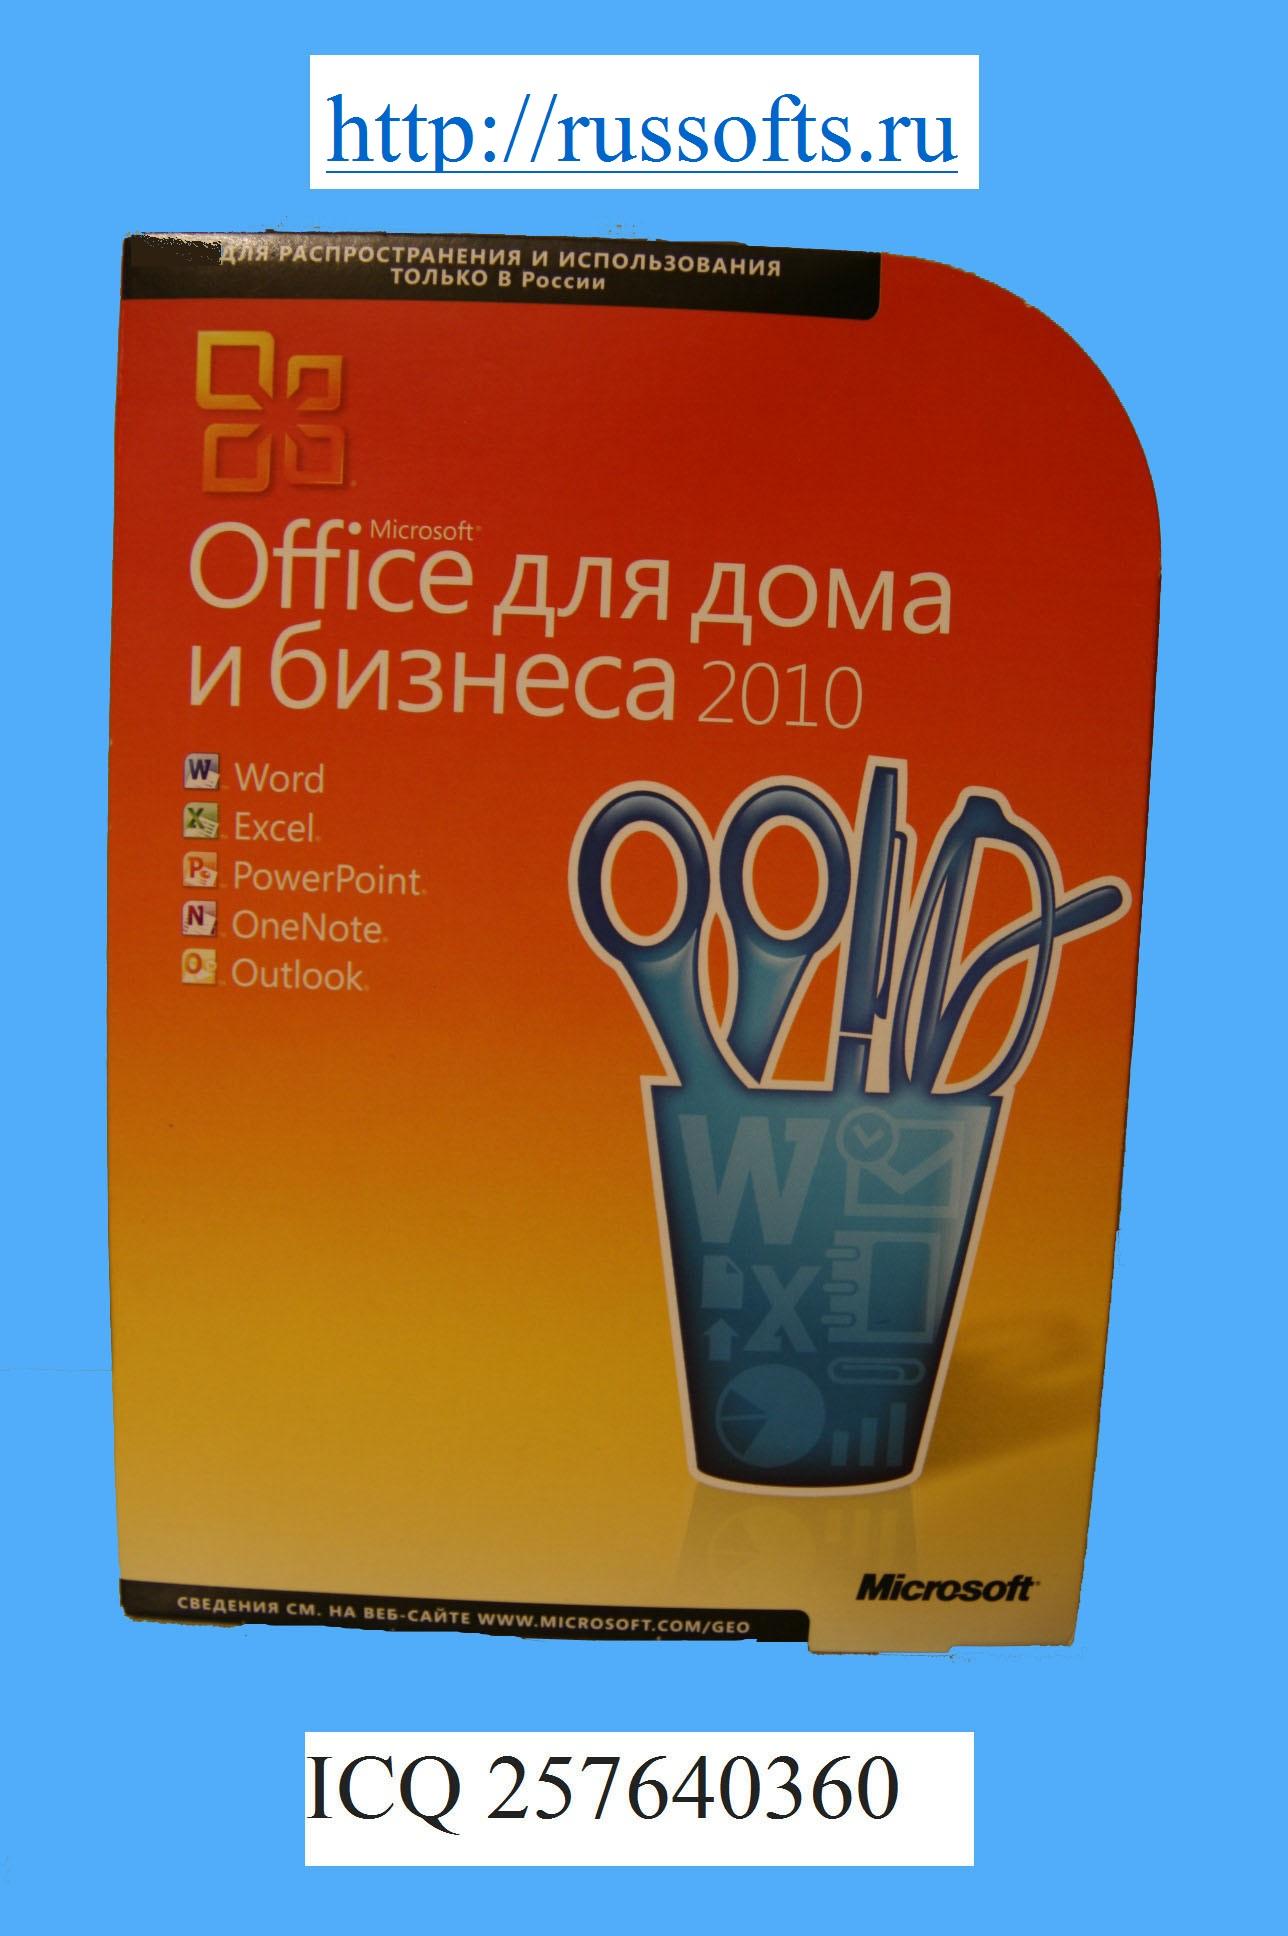 Microsoft Майкрософт купим оперативно и дорого лицензионное ПО